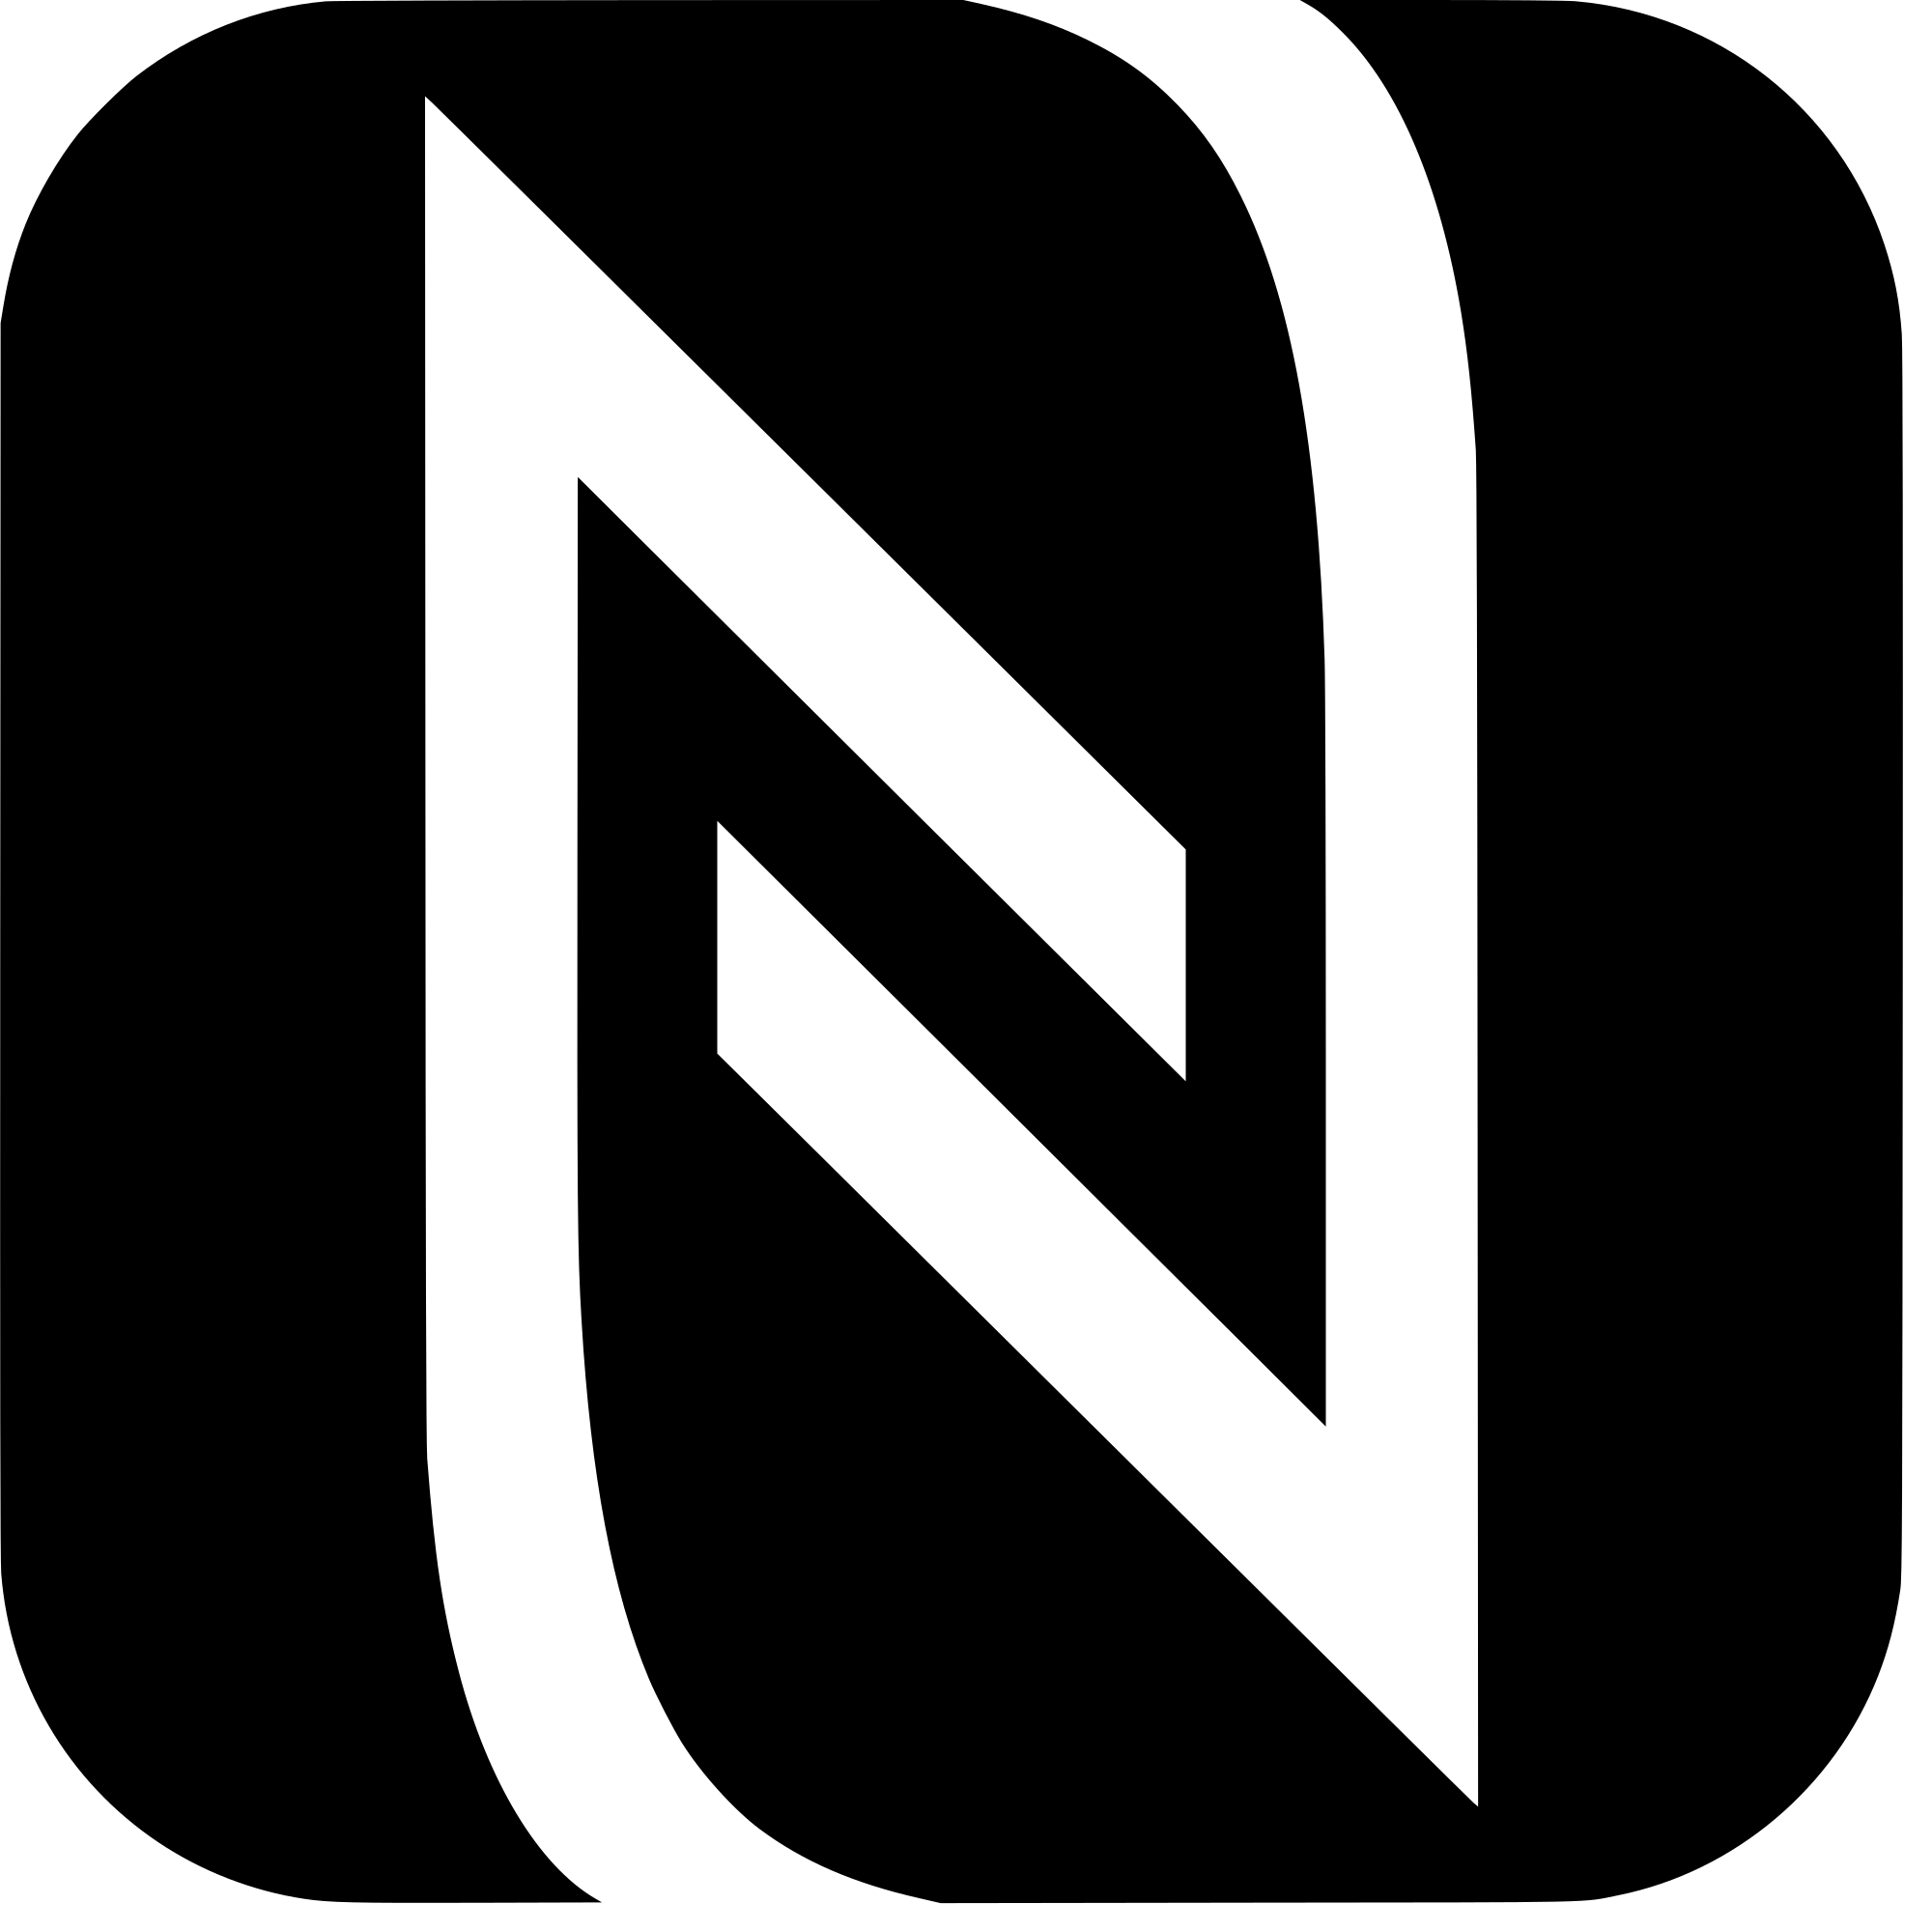 File:NFC logo.svg.